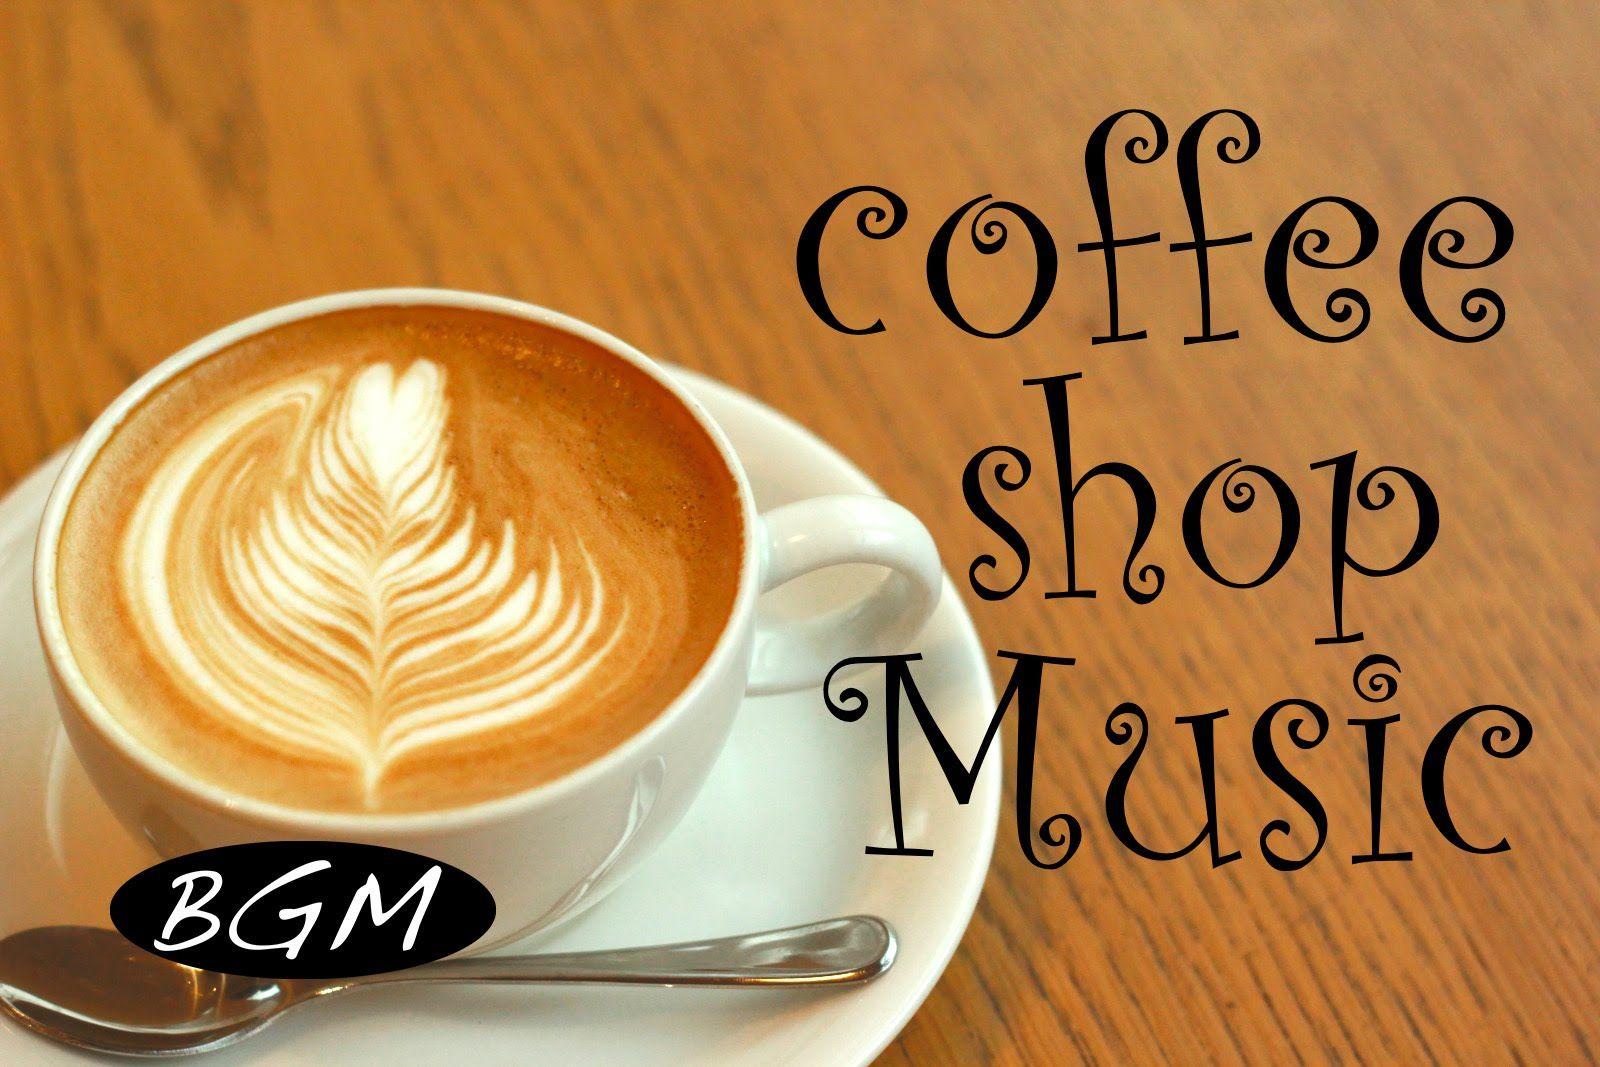 This one is a bit livelier. Cafe Music!!Jazz & Bossa Nova